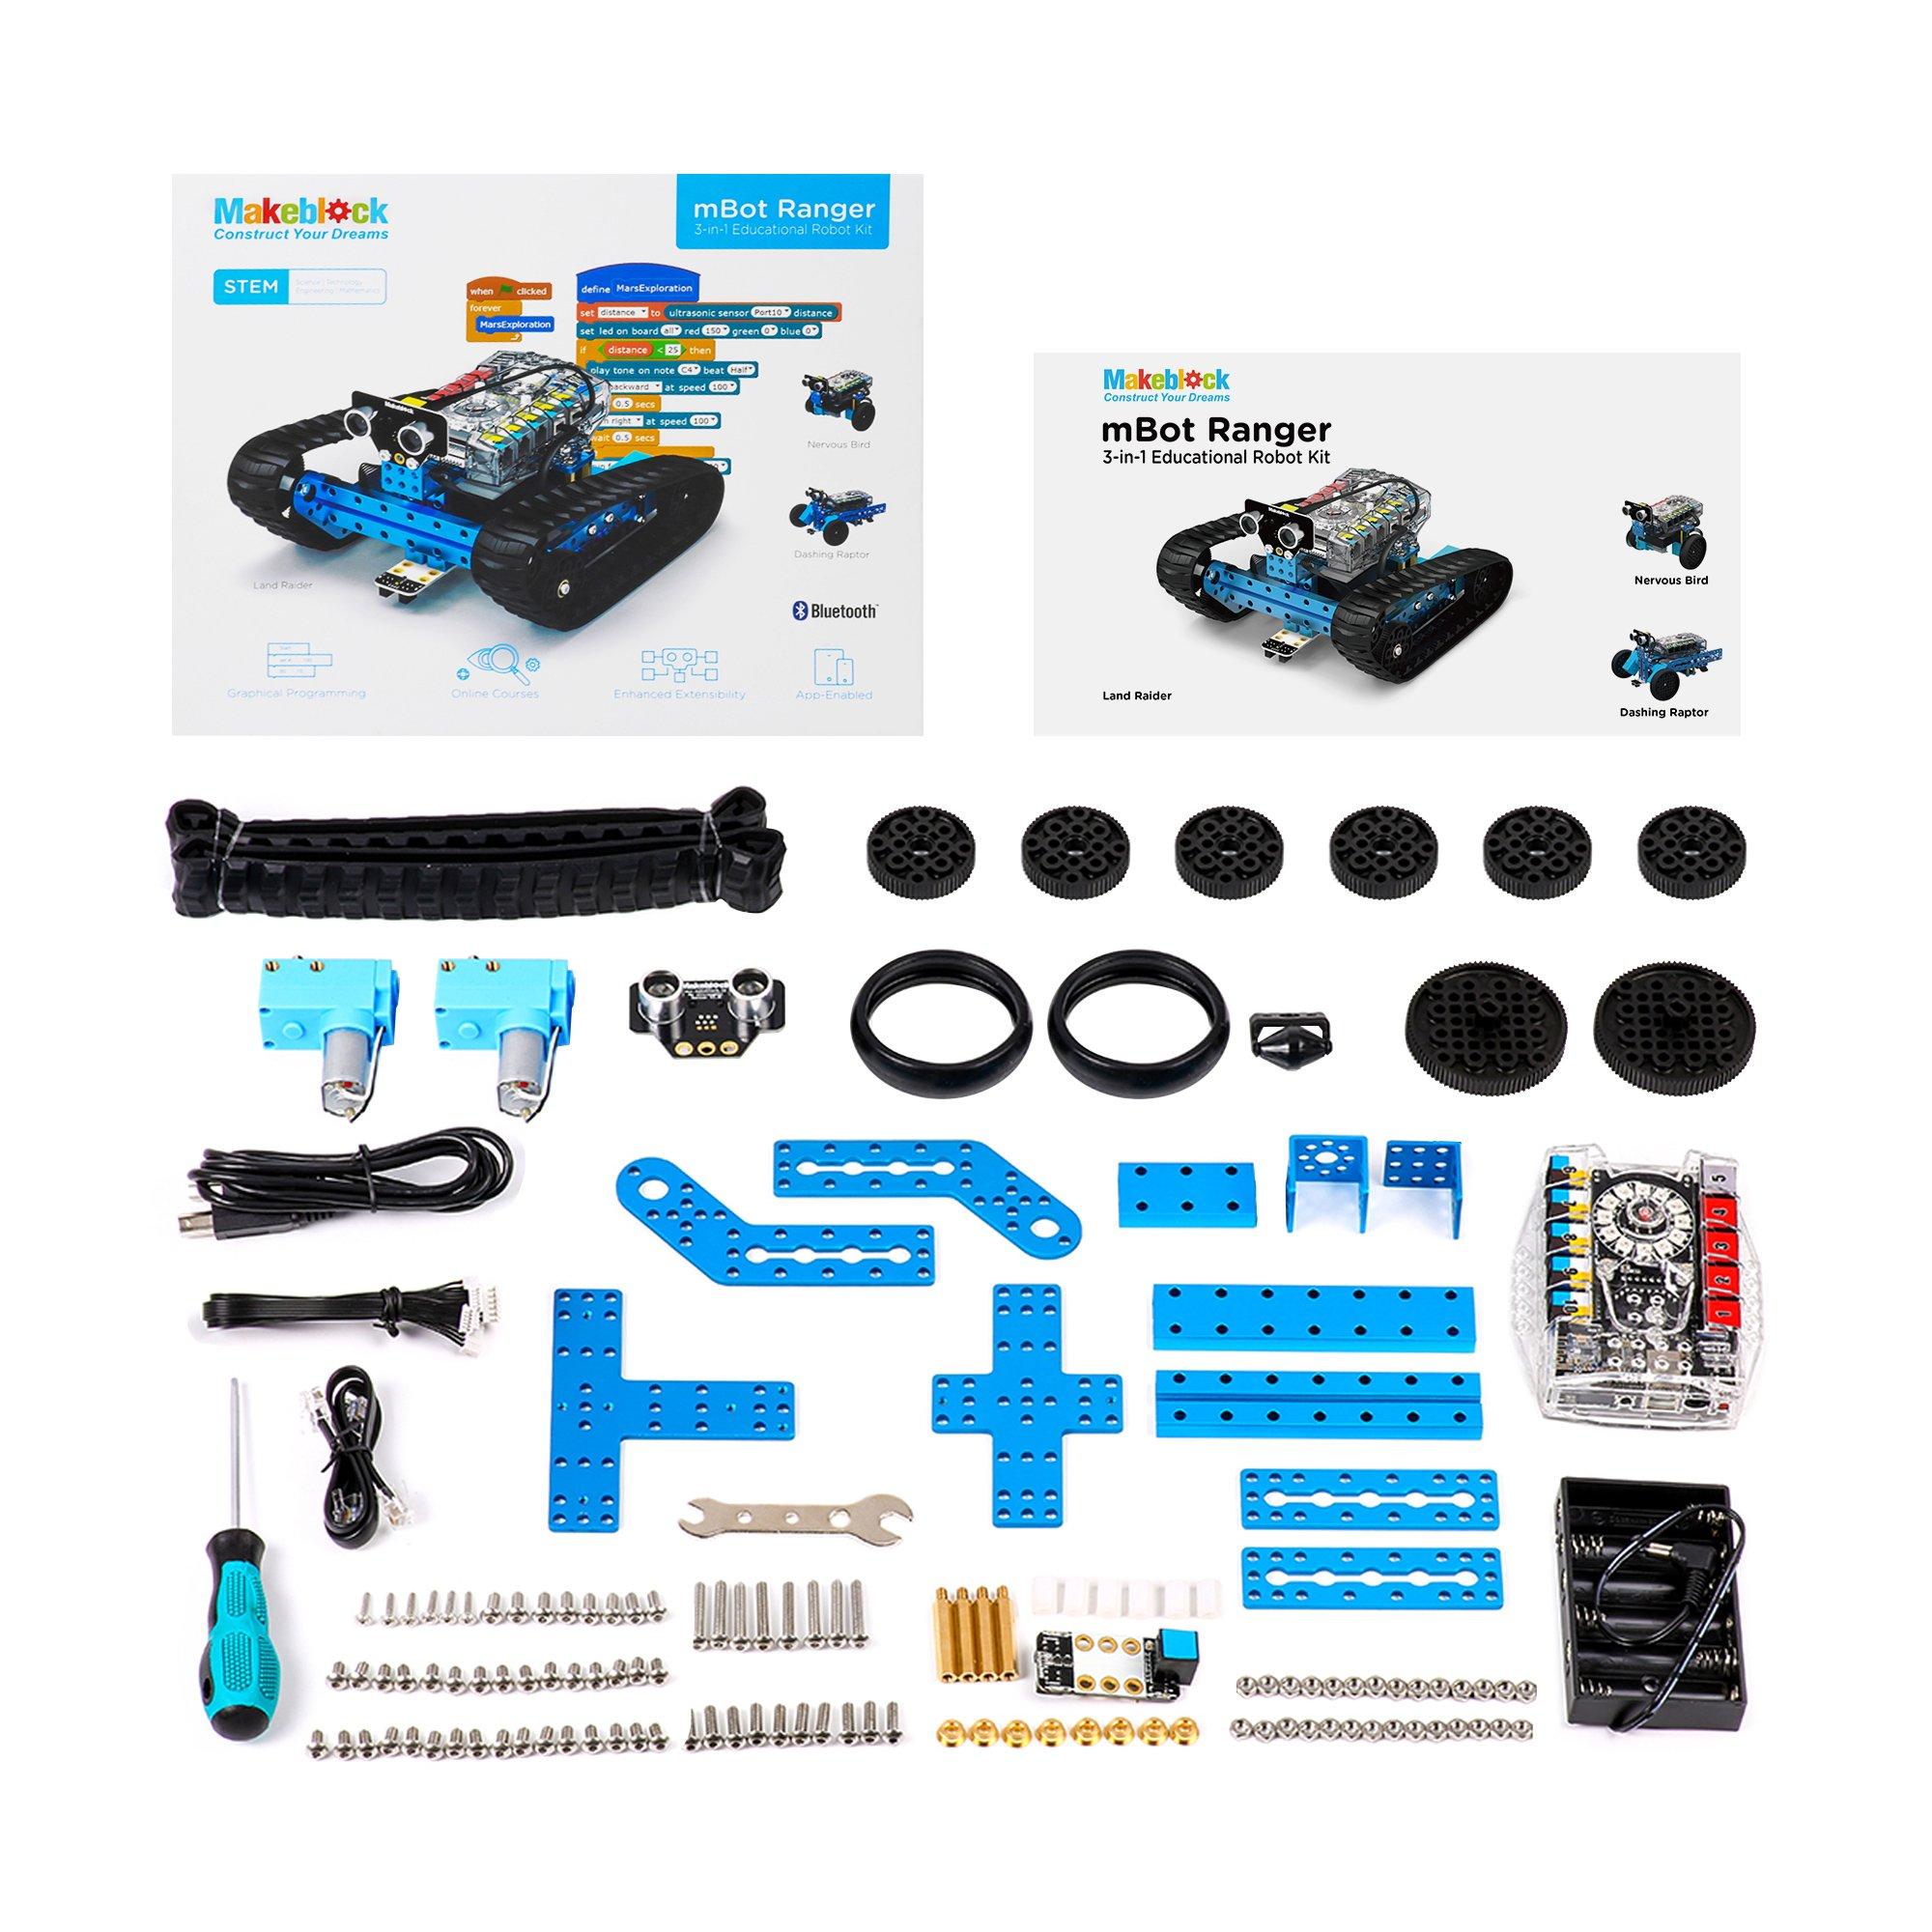 Makeblock Programmable mBot Ranger Robot Kit, STEM Educational Engineering Design & Build 3 in 1 Programmable Robotic System Kit - Ages 10+ by Makeblock (Image #6)